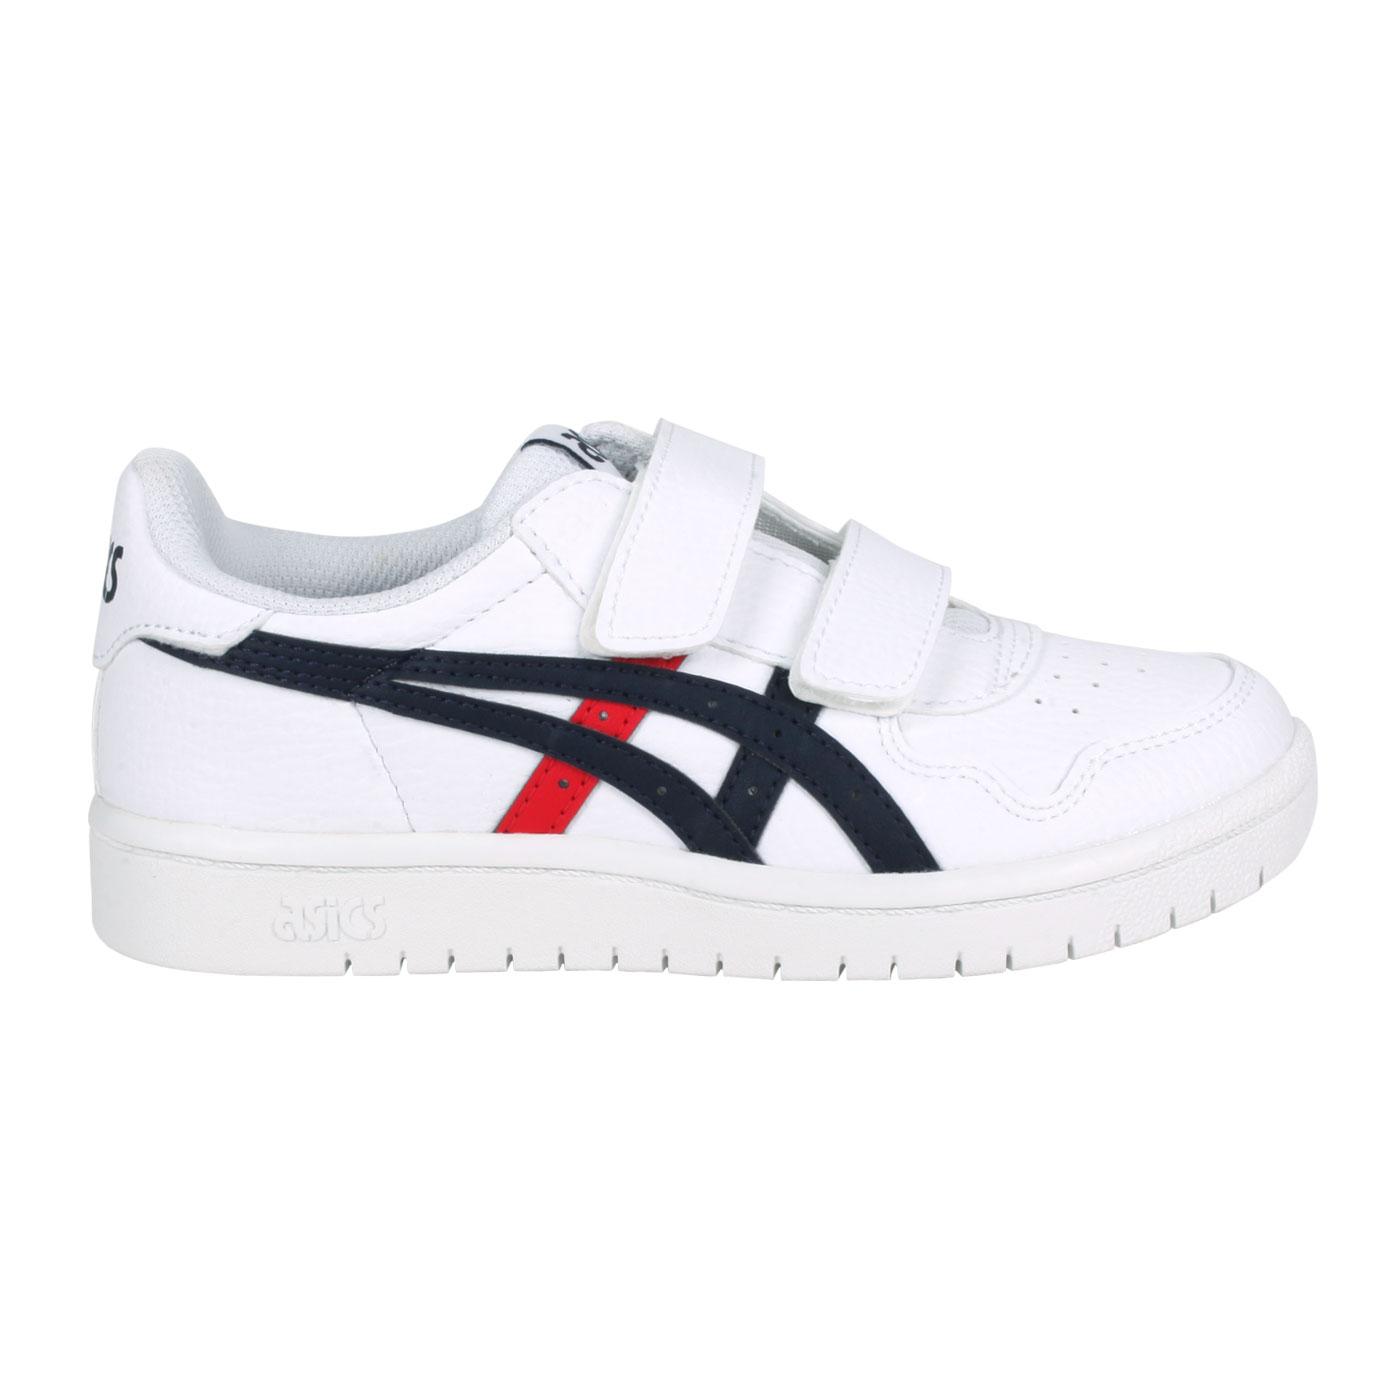 ASICS 中童運動鞋  @JAPAN S PS@1194A077-103 - 白黑紅